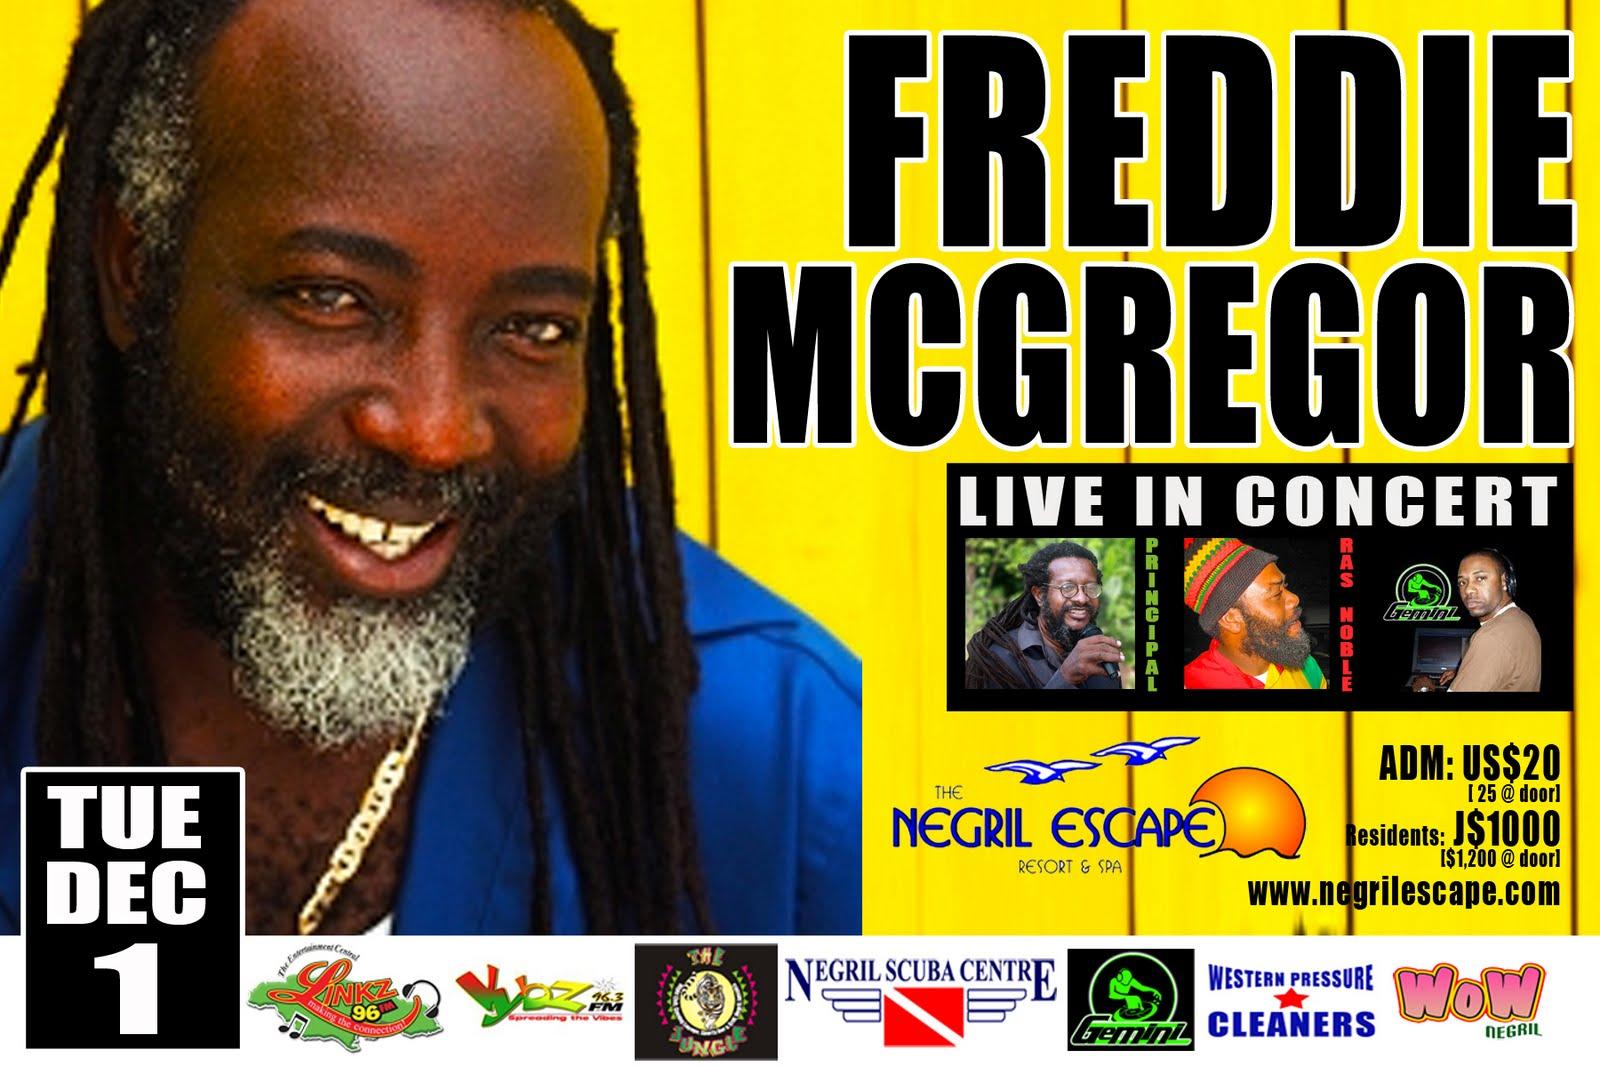 Freddie Mcgregor Jannus Live